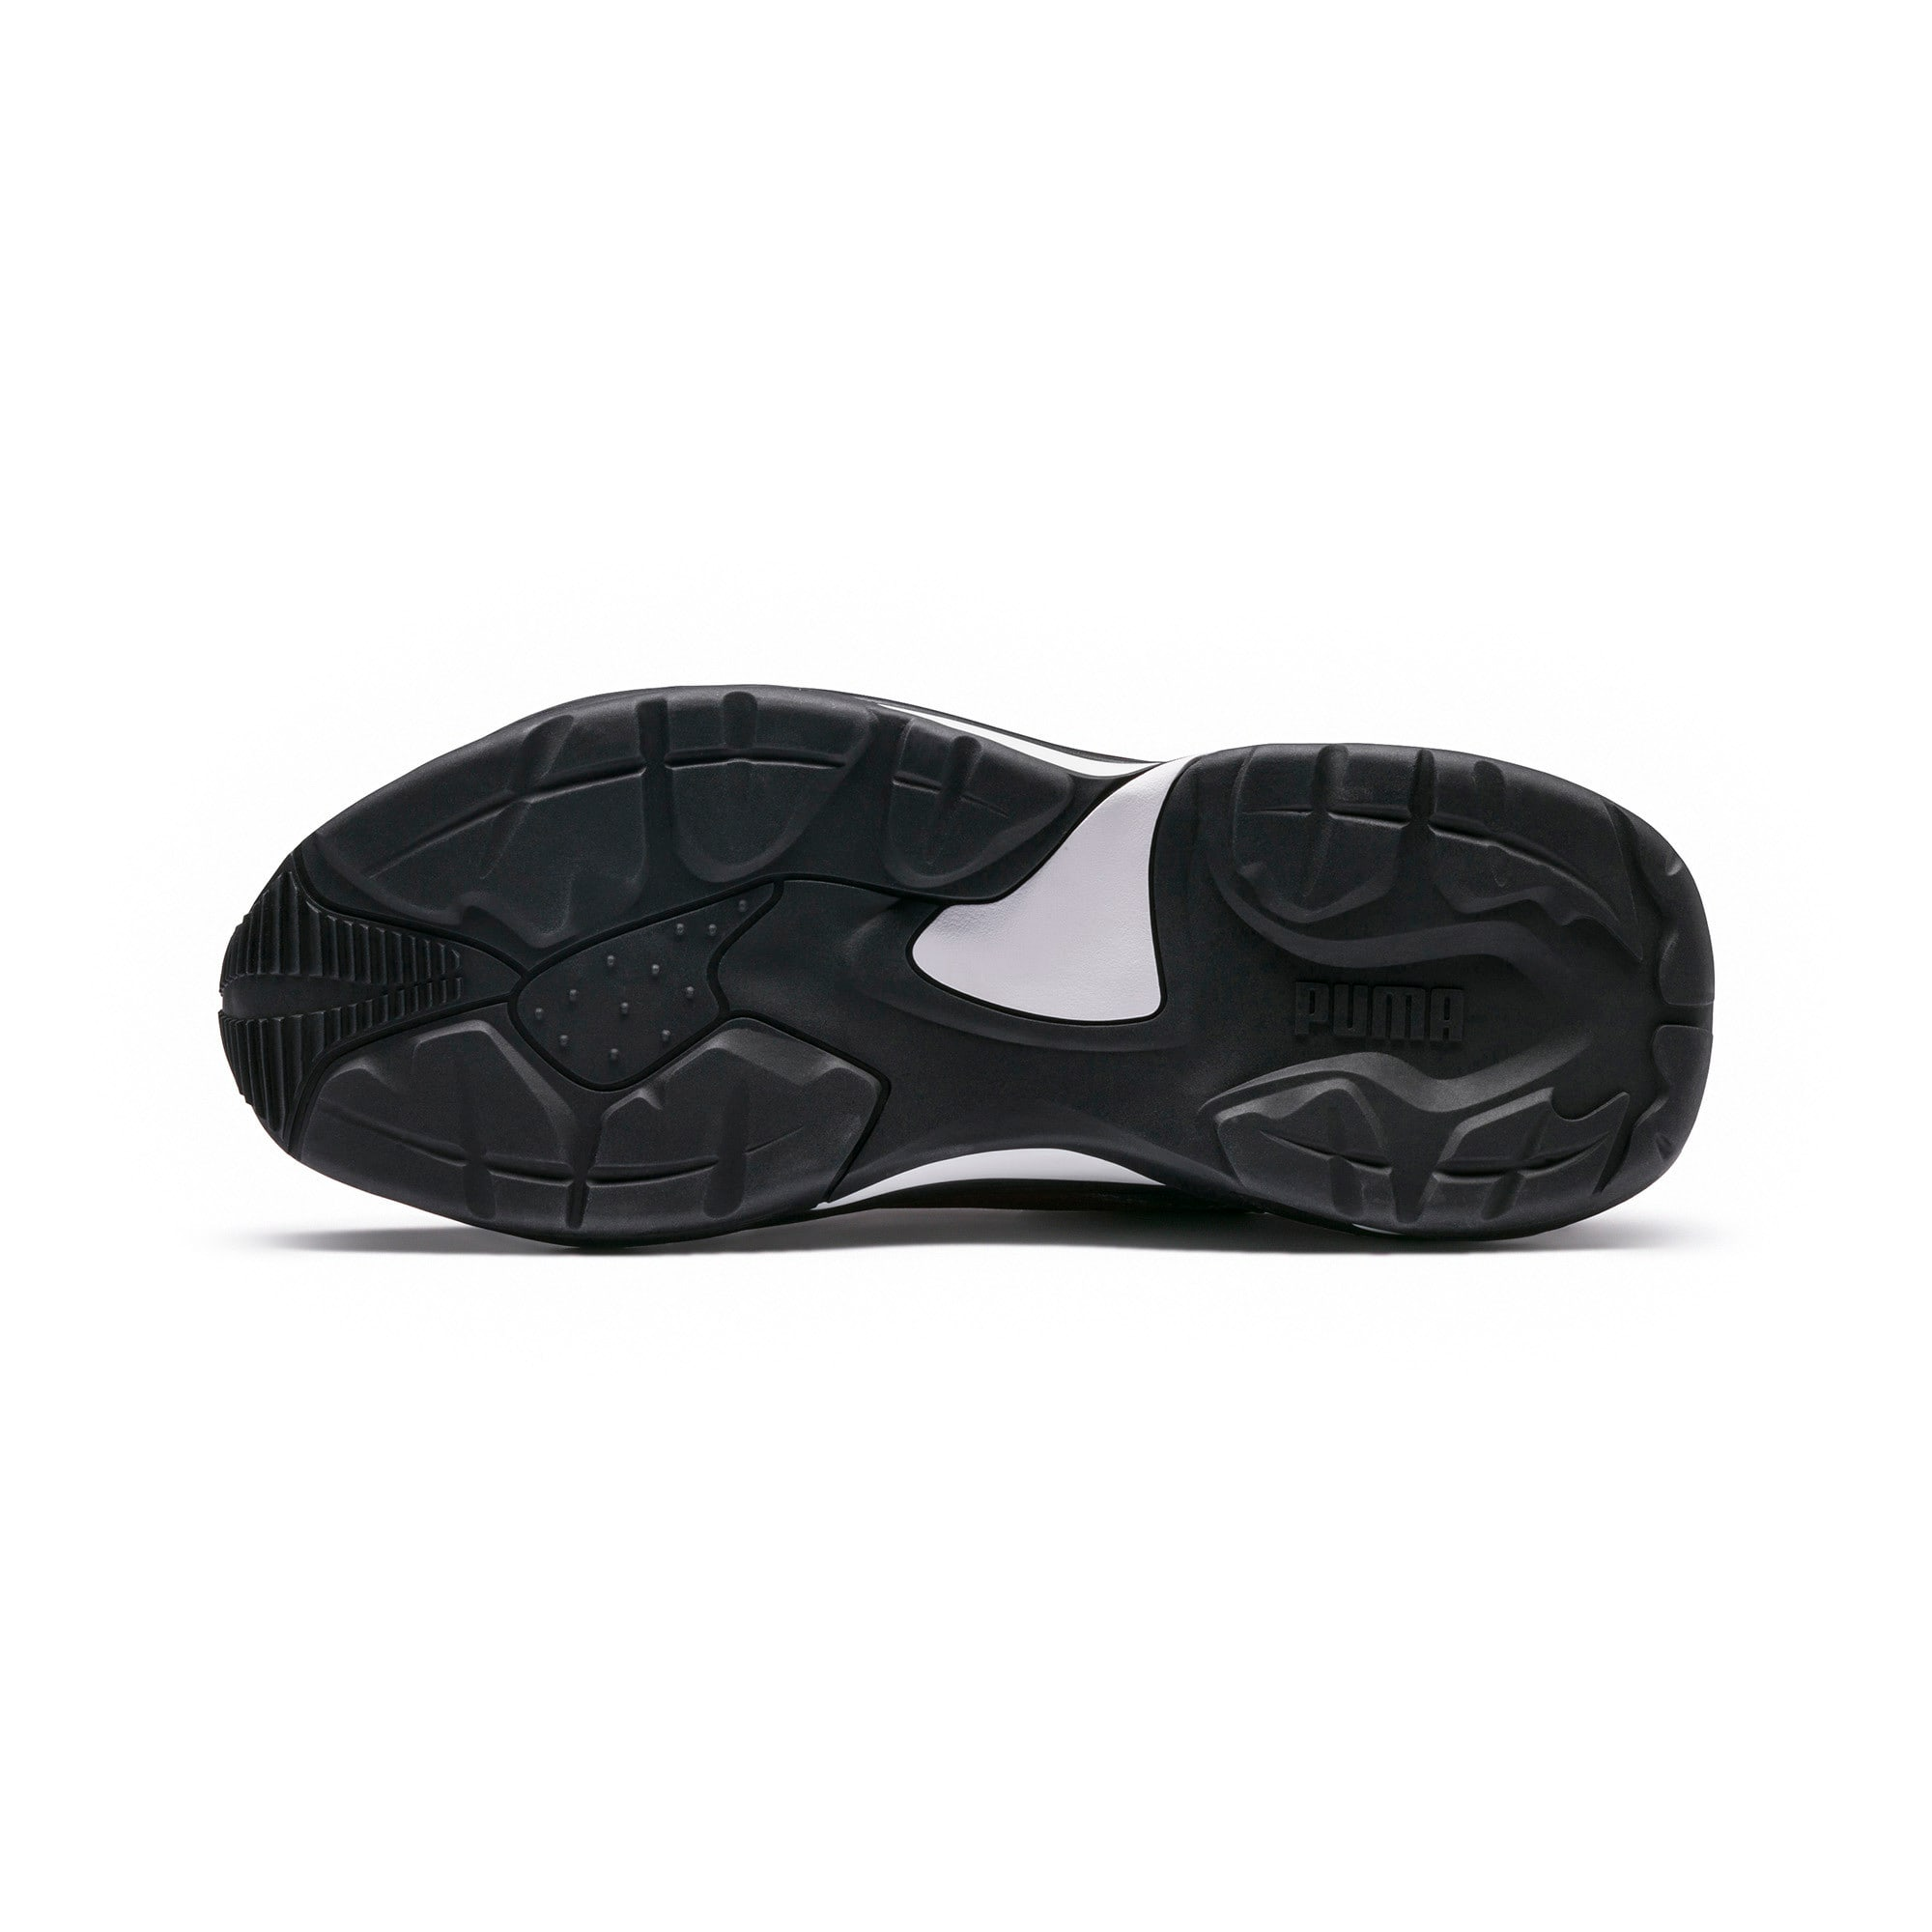 Miniatura 3 de Zapatos deportivosThunder Spectrapara hombre, Rhododendron-P Black-T Port, mediano